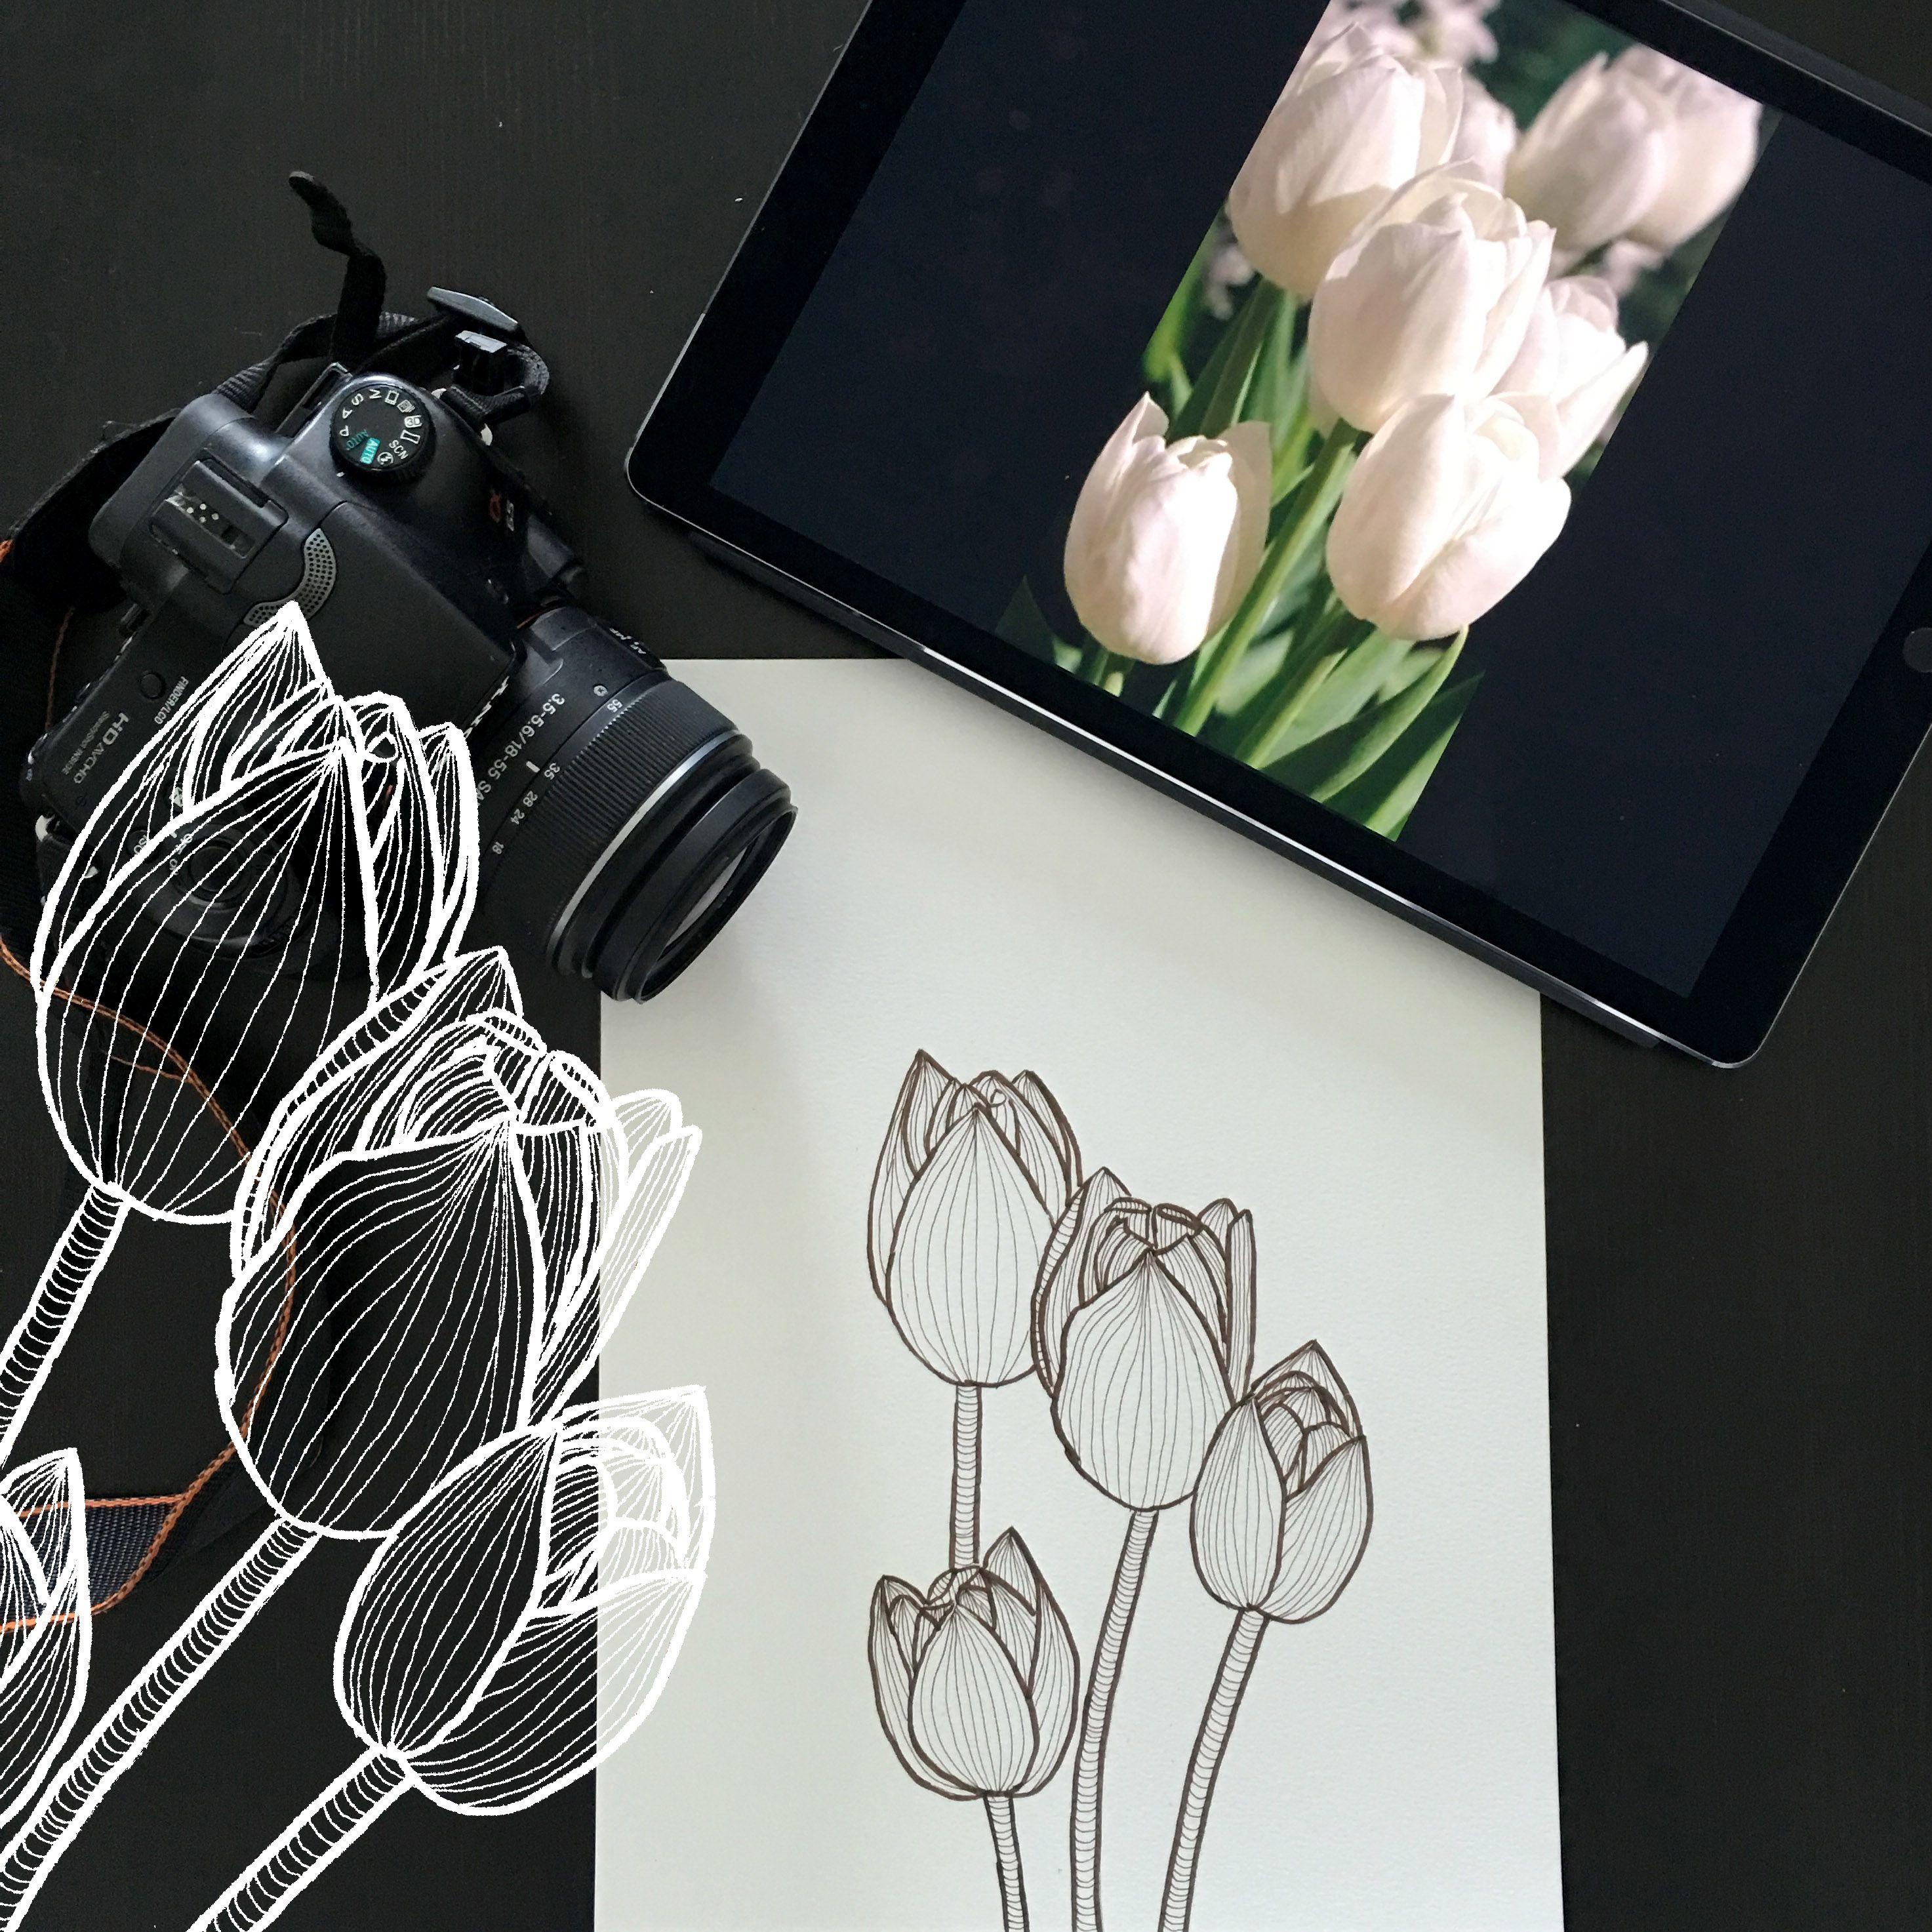 Day 24 #30ideas30days #illustration #flowers #blackandwhite #drawing #patternly.design #30ideias30dias #ilustração #flores #pretoebranco #desenhoobservacao #decolalab2016 #oficinaamandamol